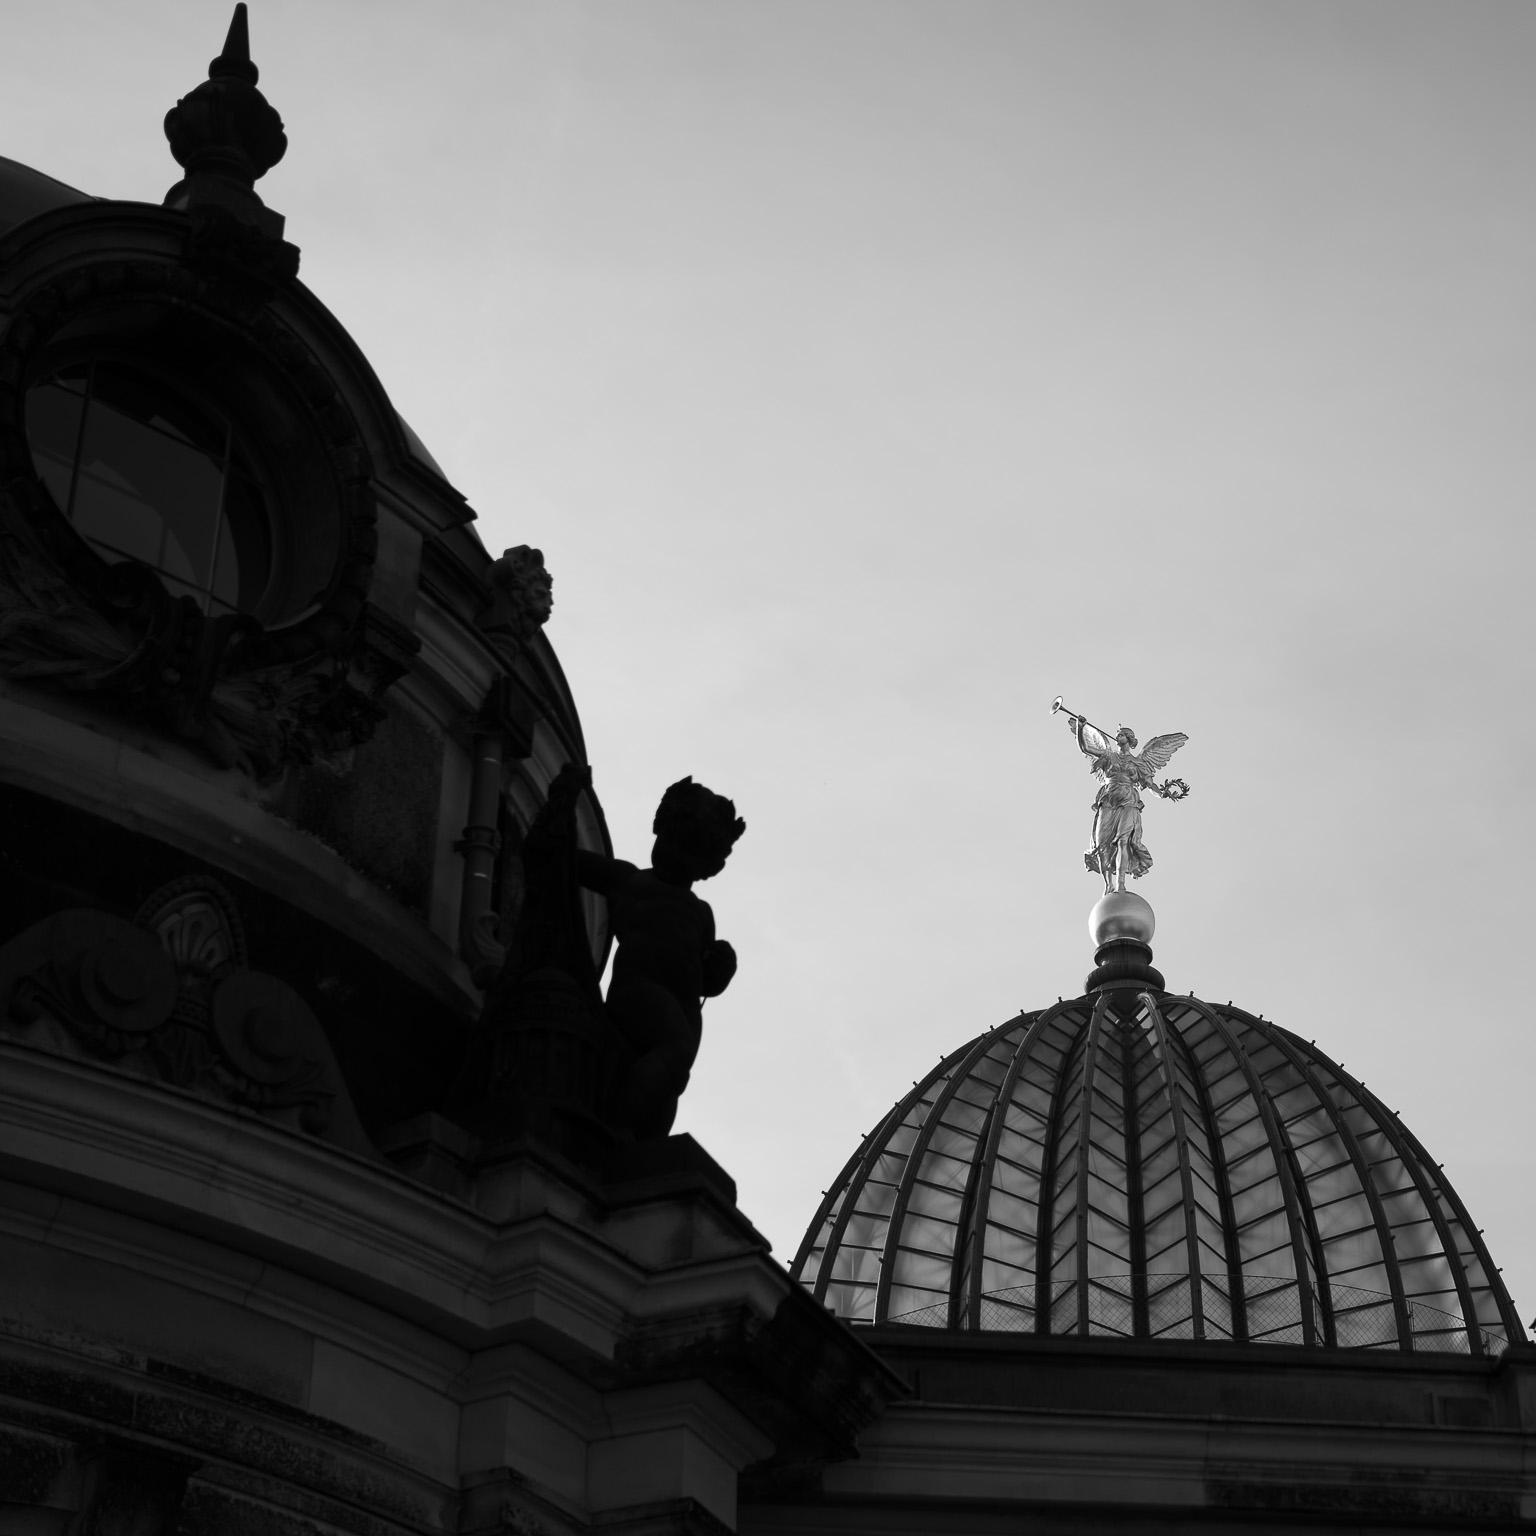 01-Dresden-0029-P-1410.jpg